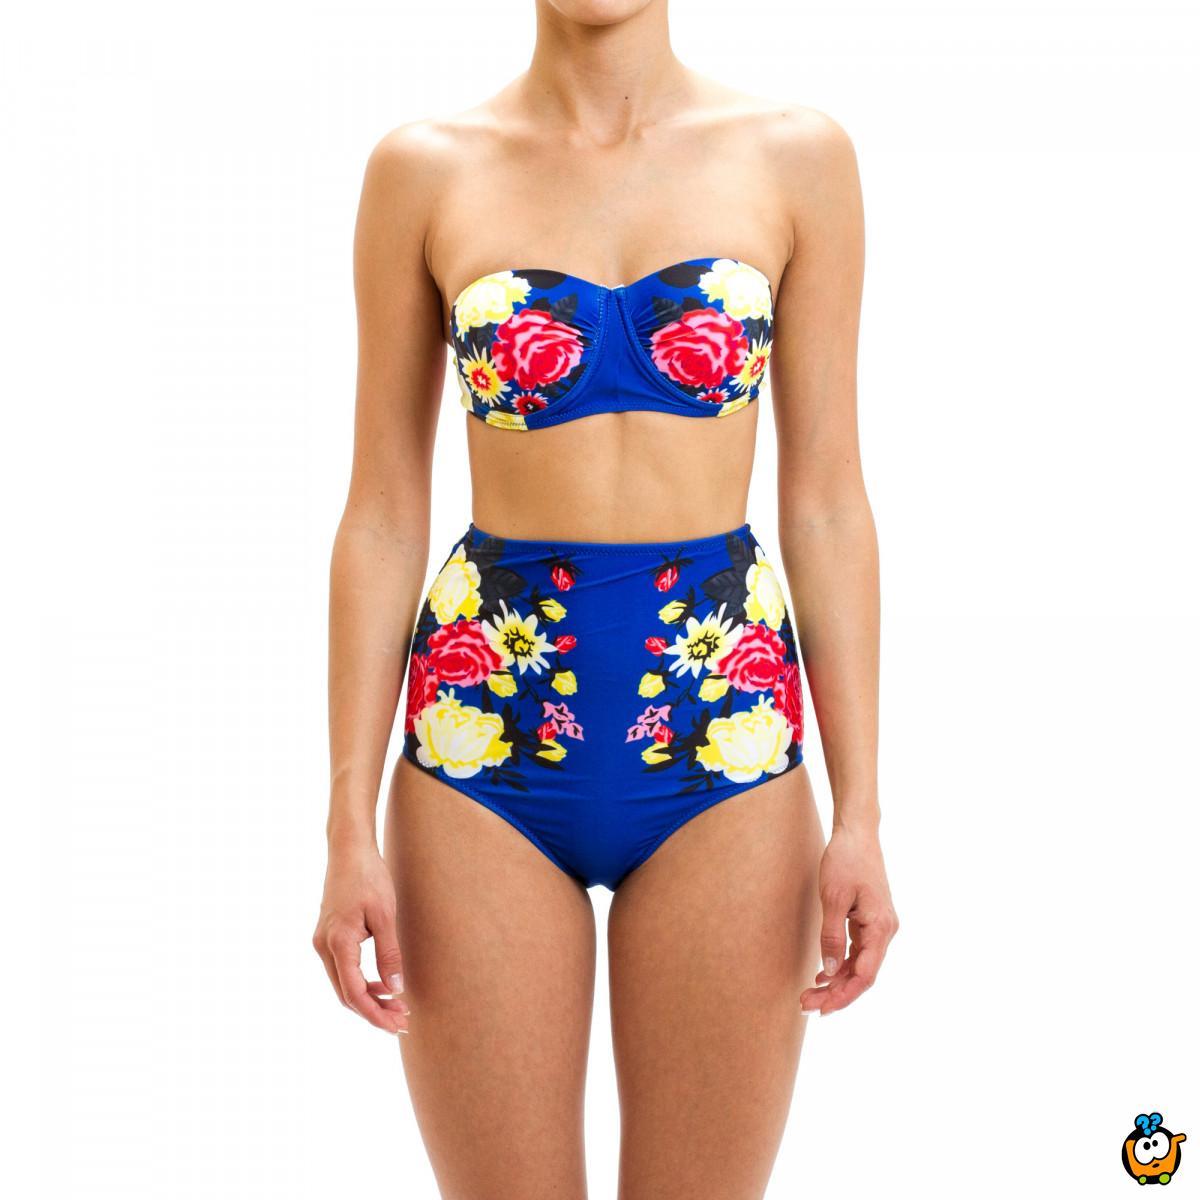 Dvodelni ženski kupaći kostim - RETRO FLOW BRILLIANT BLUE